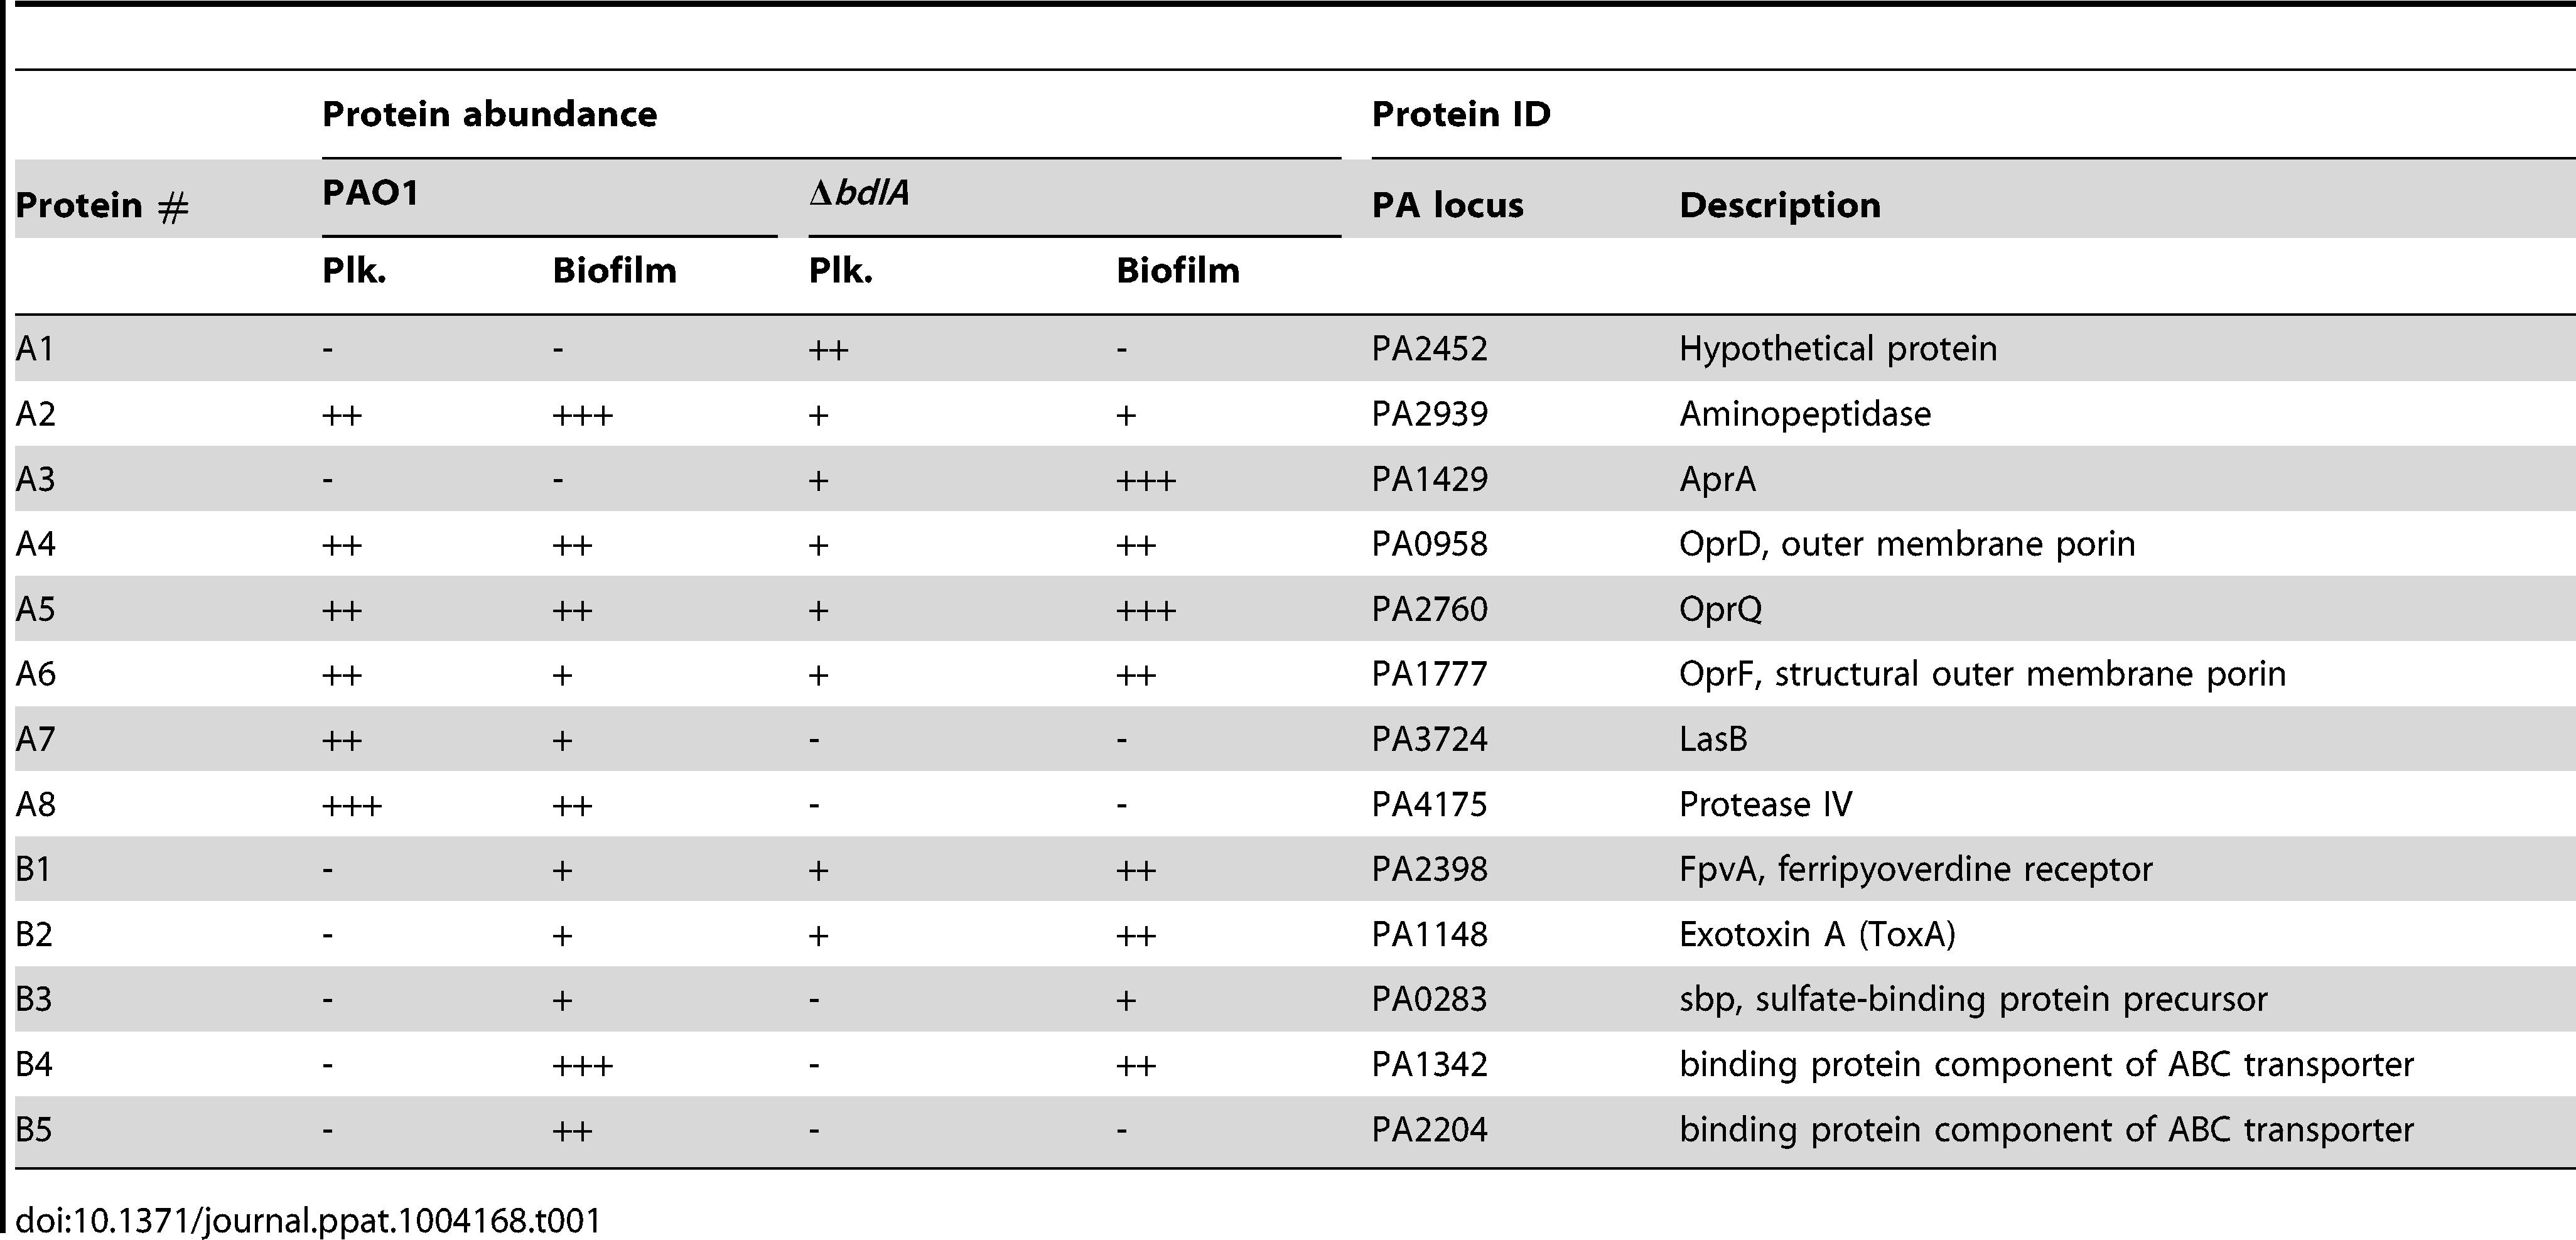 Identification of proteins present in supernatants.